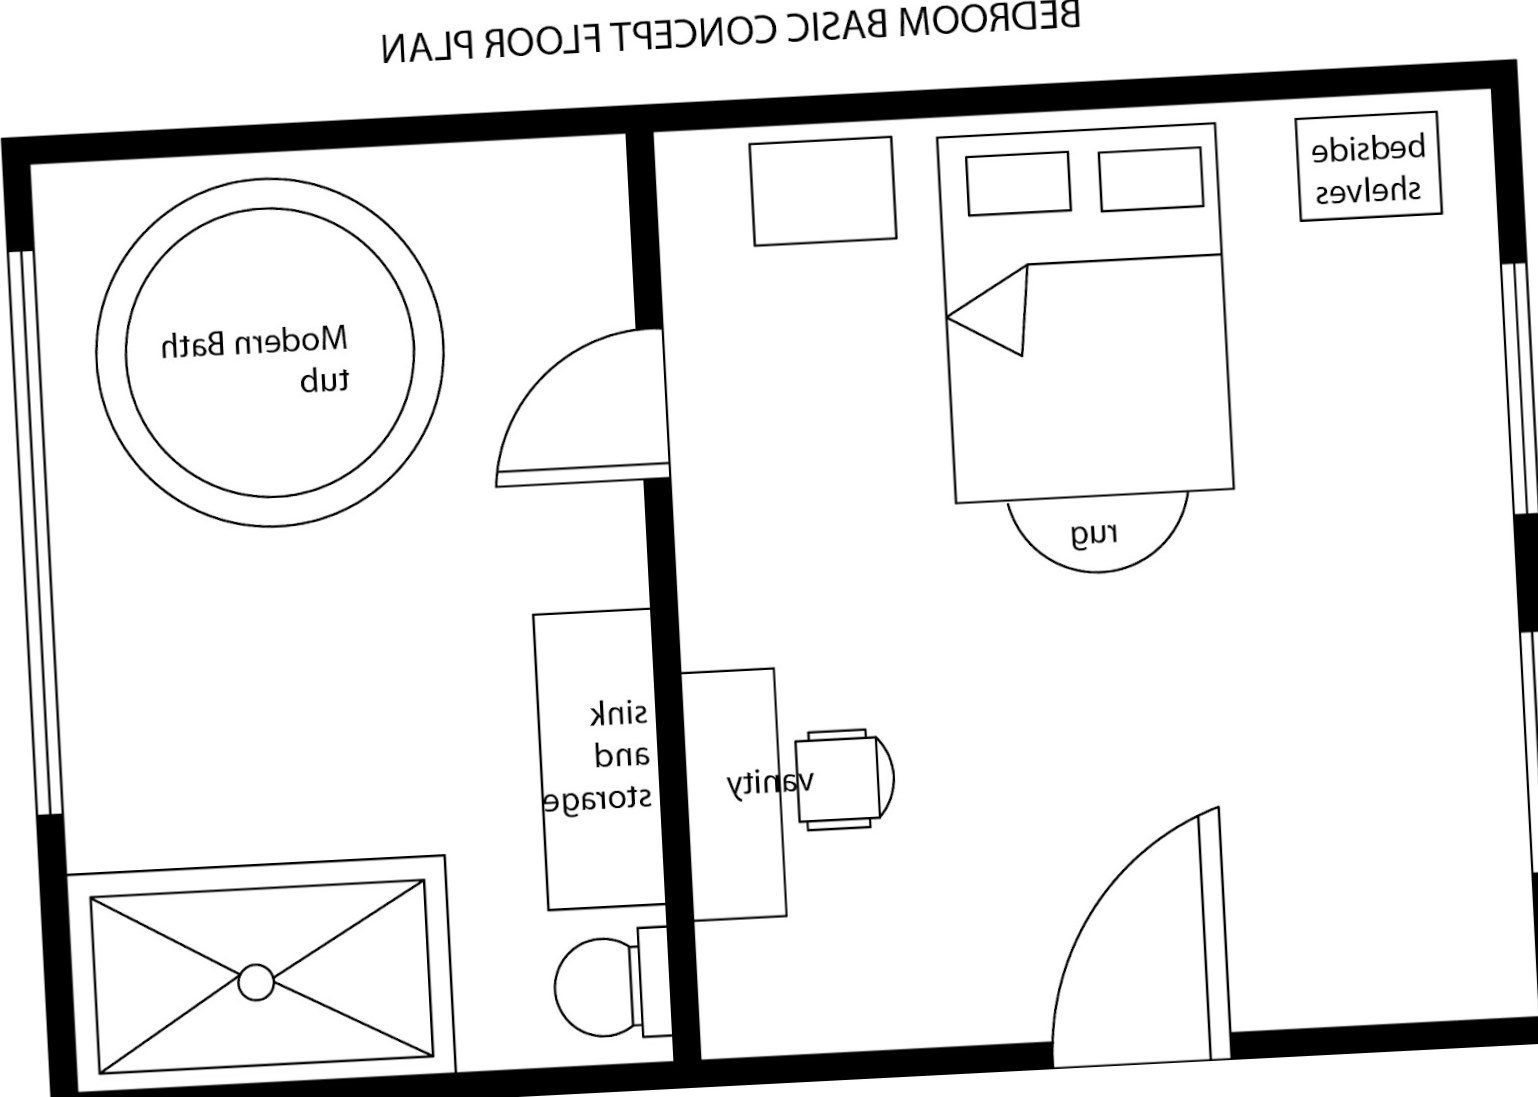 Bedroom blueprint maker httpsbedroom design 2017fointerior bedroom blueprint maker httpsbedroom design 2017fo malvernweather Choice Image